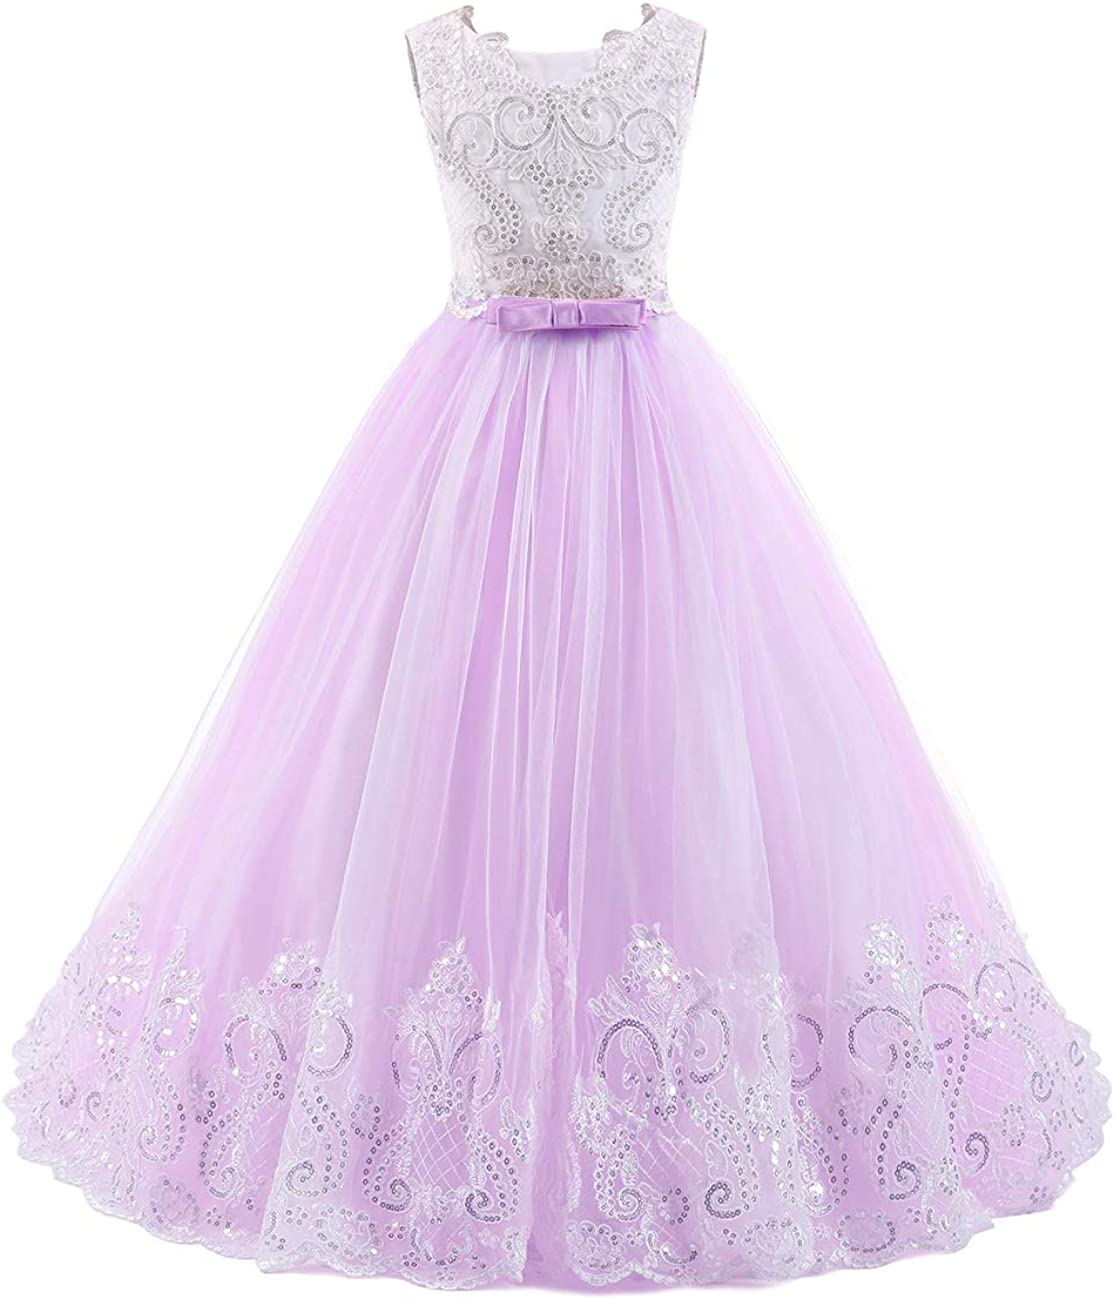 Flower Girl Dress for Wedding Party Dresses Princess Tulle Dress Long Girls Pageant Dresses